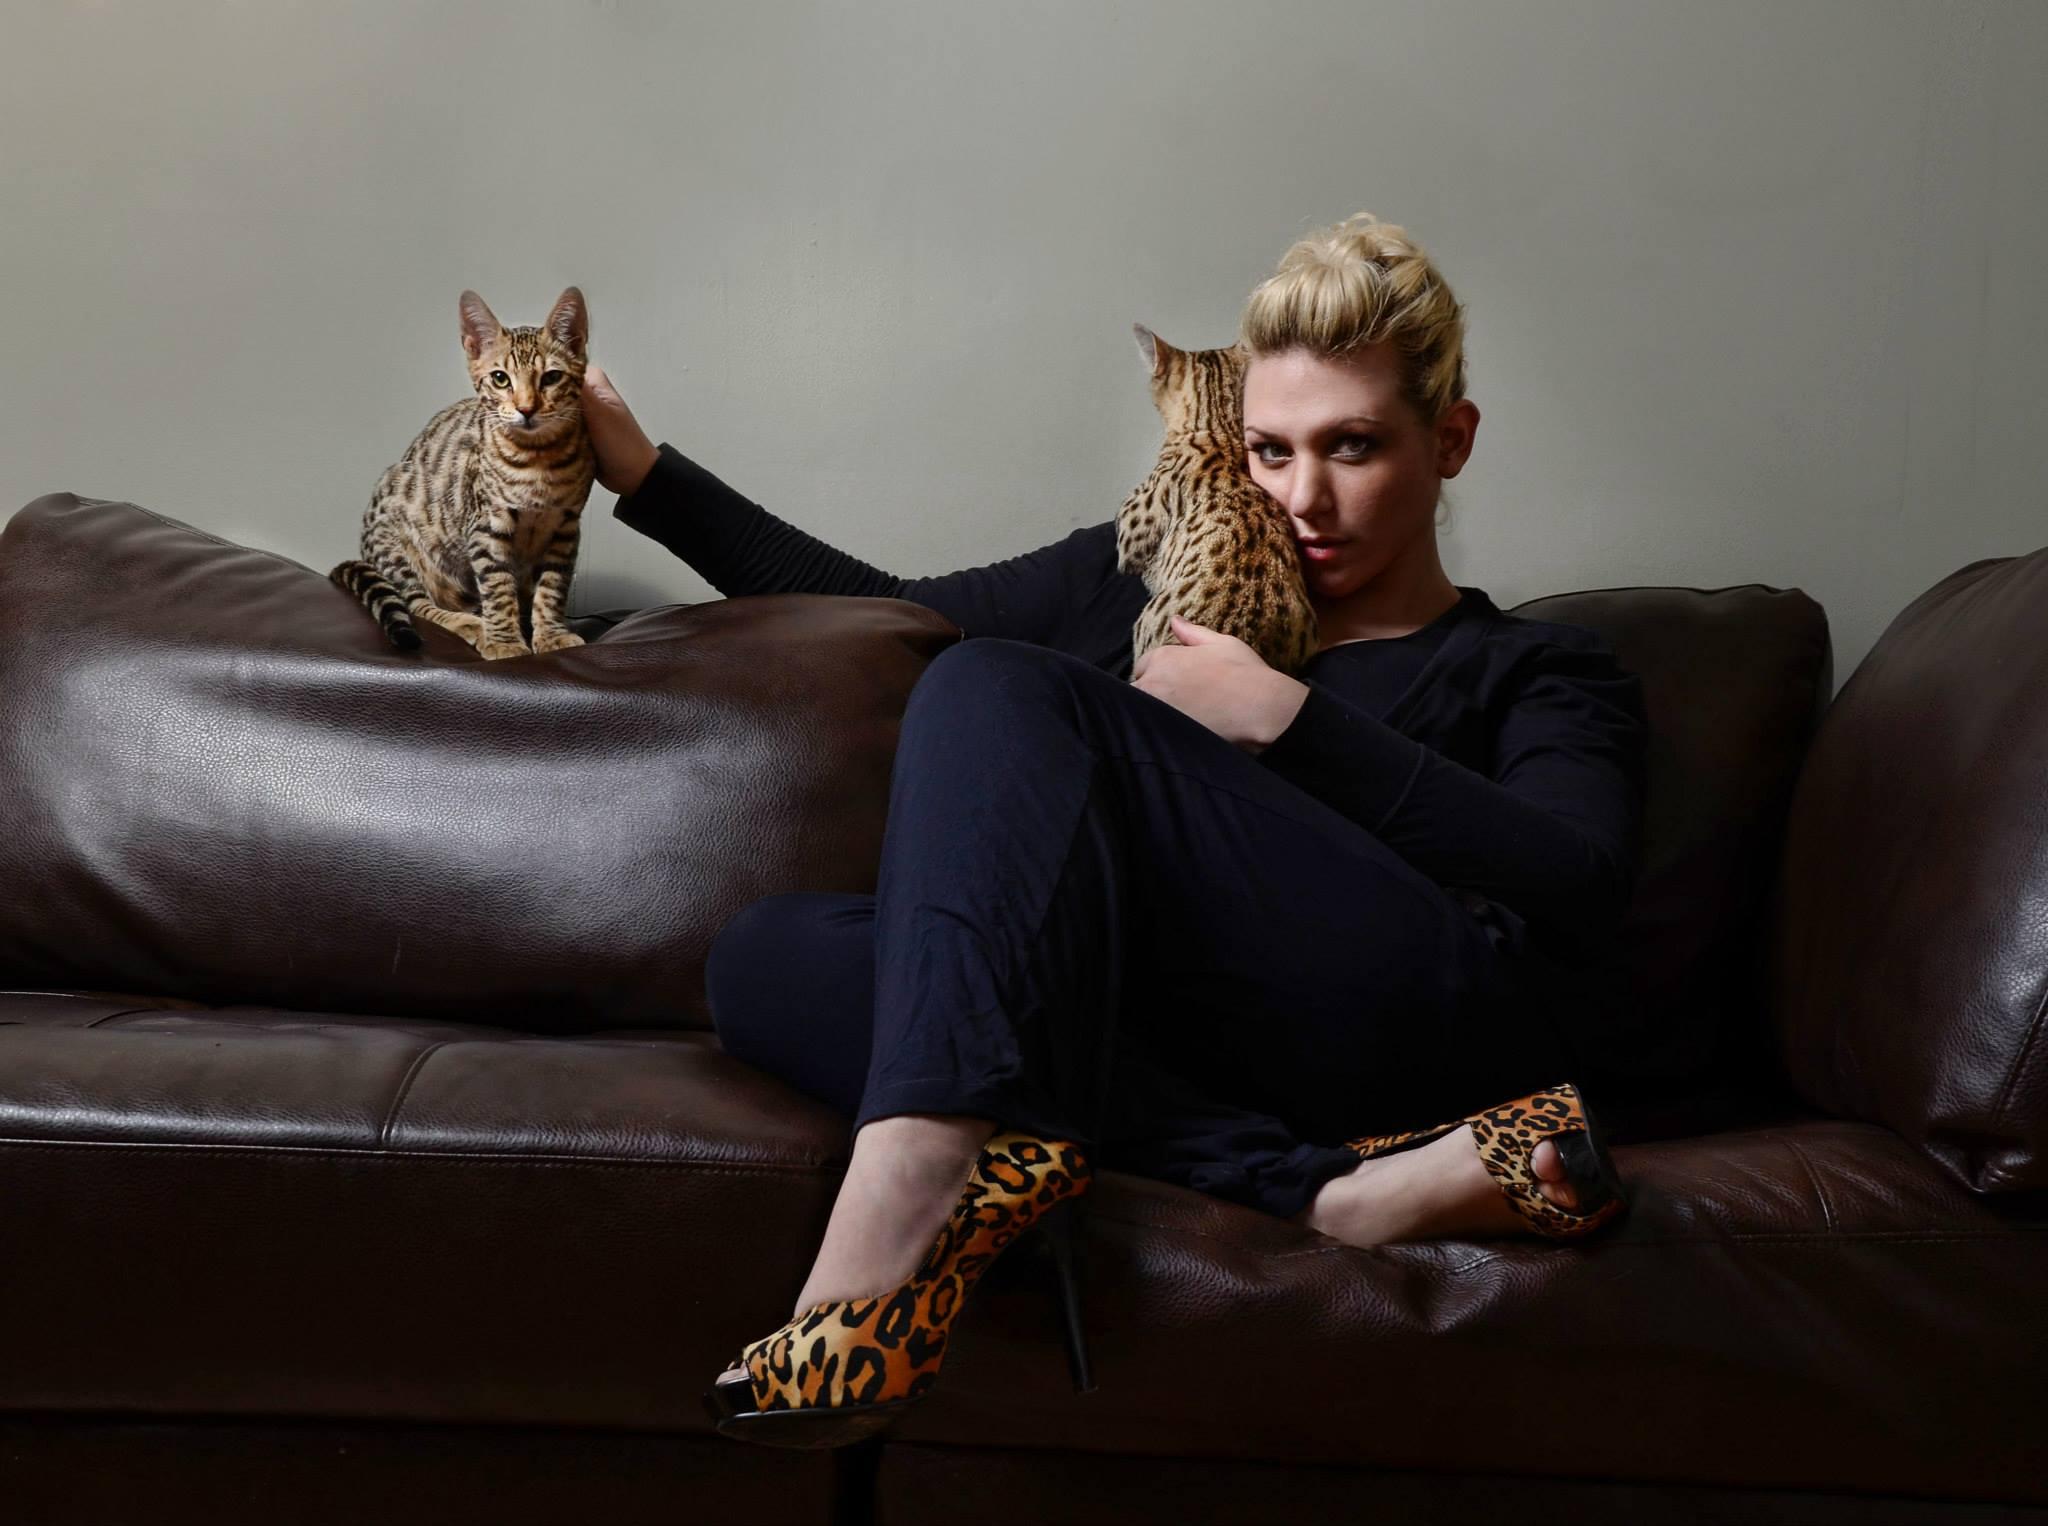 Lora Michael and Kitties.